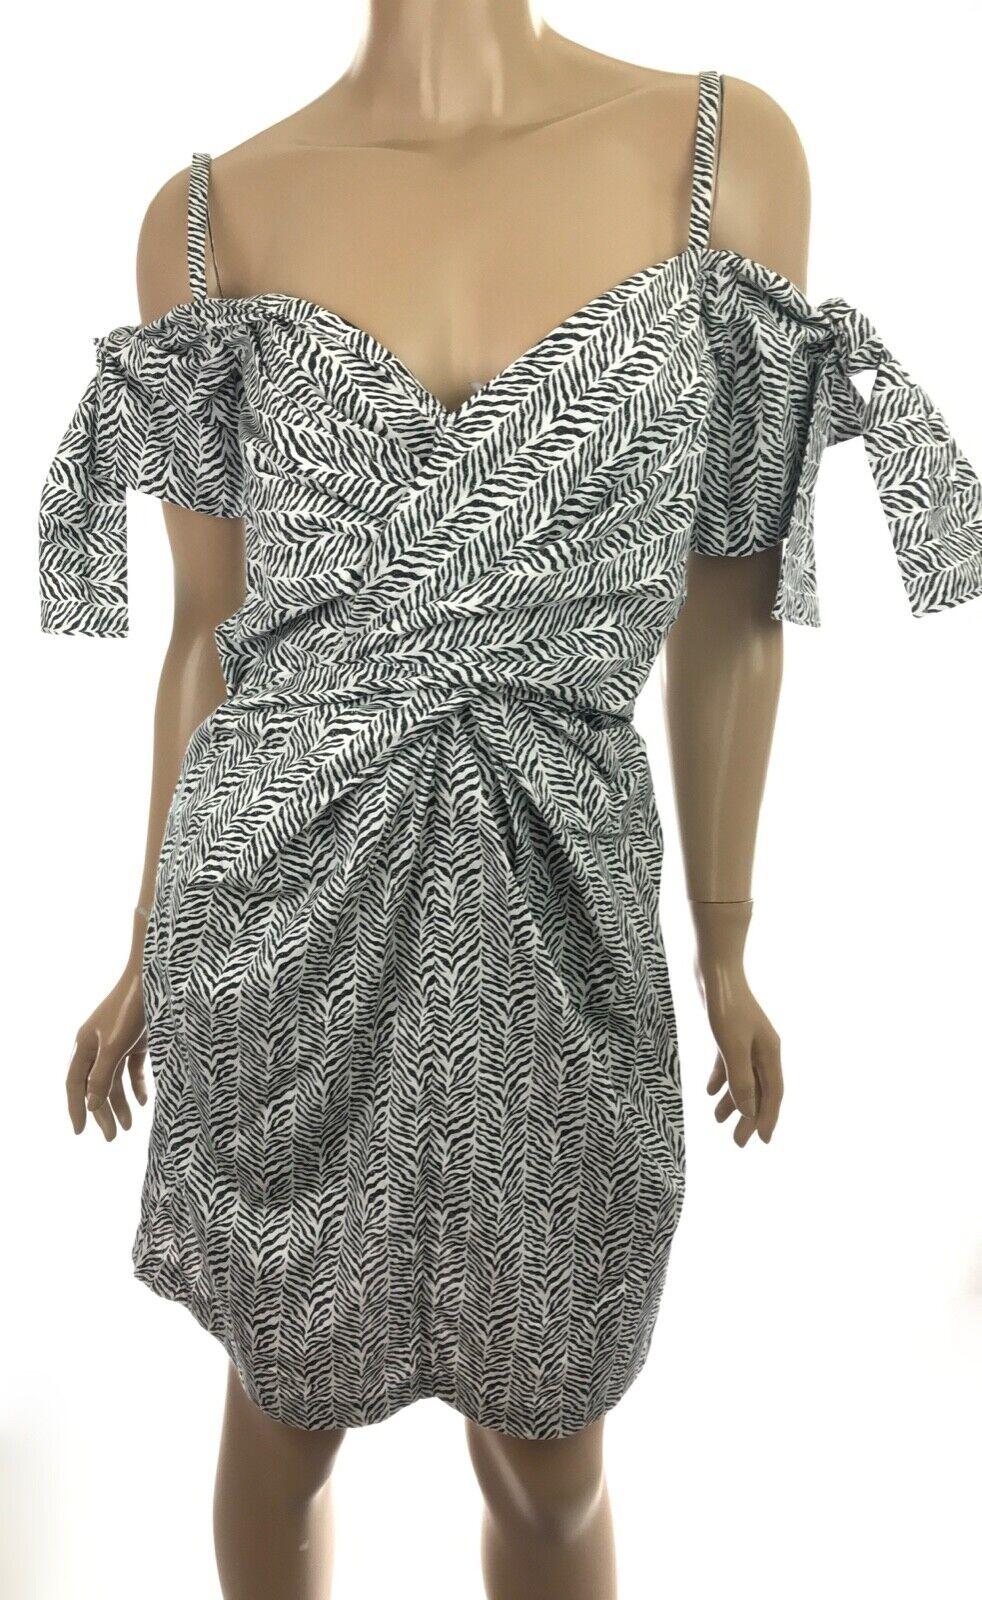 Edun Herringbone Poplin Twist Dress schwarz & Weiß Zebra Print